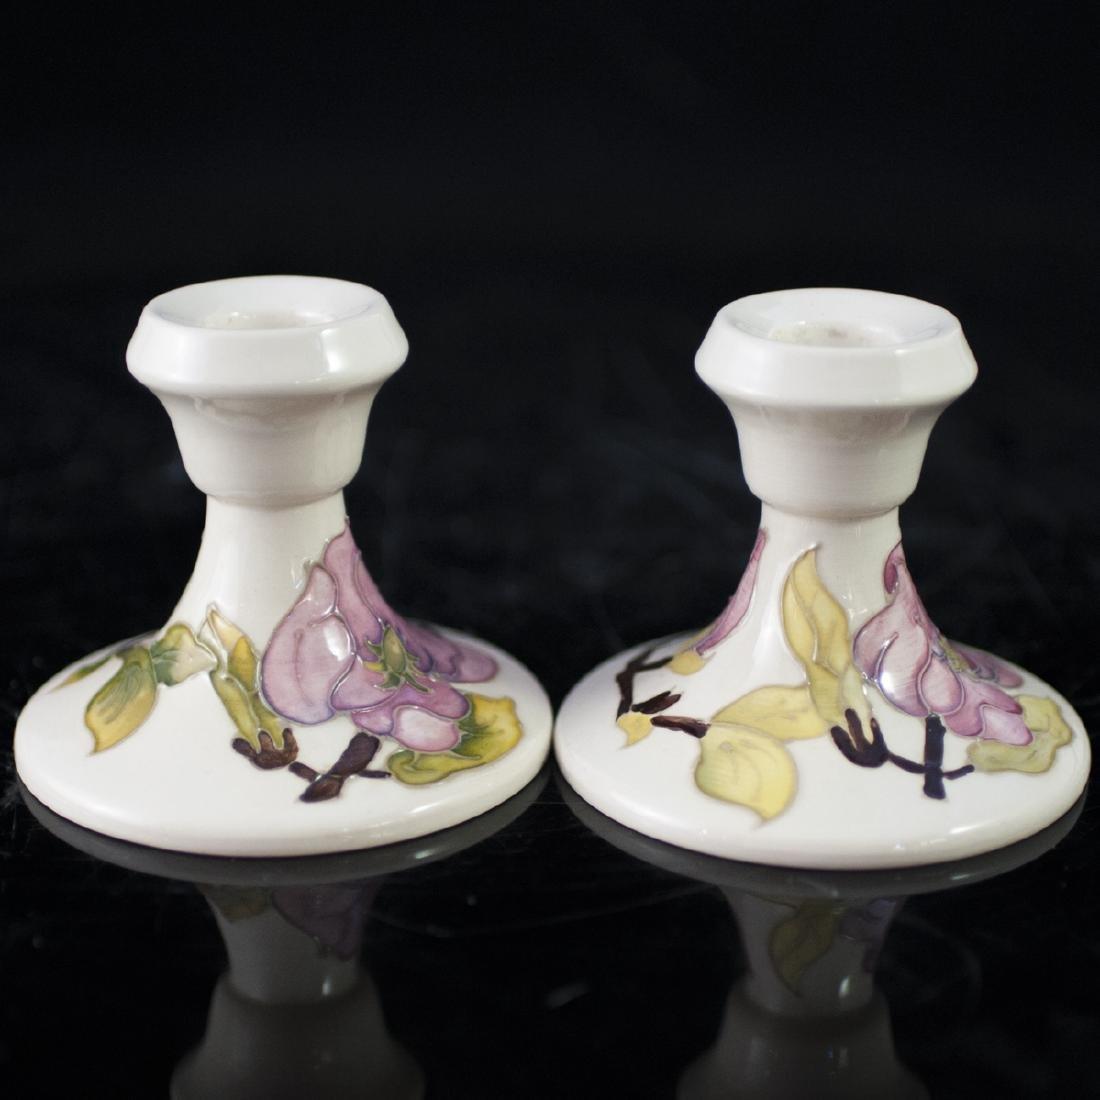 Magnolia pottery candlesticks moorcroft magnolia pottery candlesticks reviewsmspy